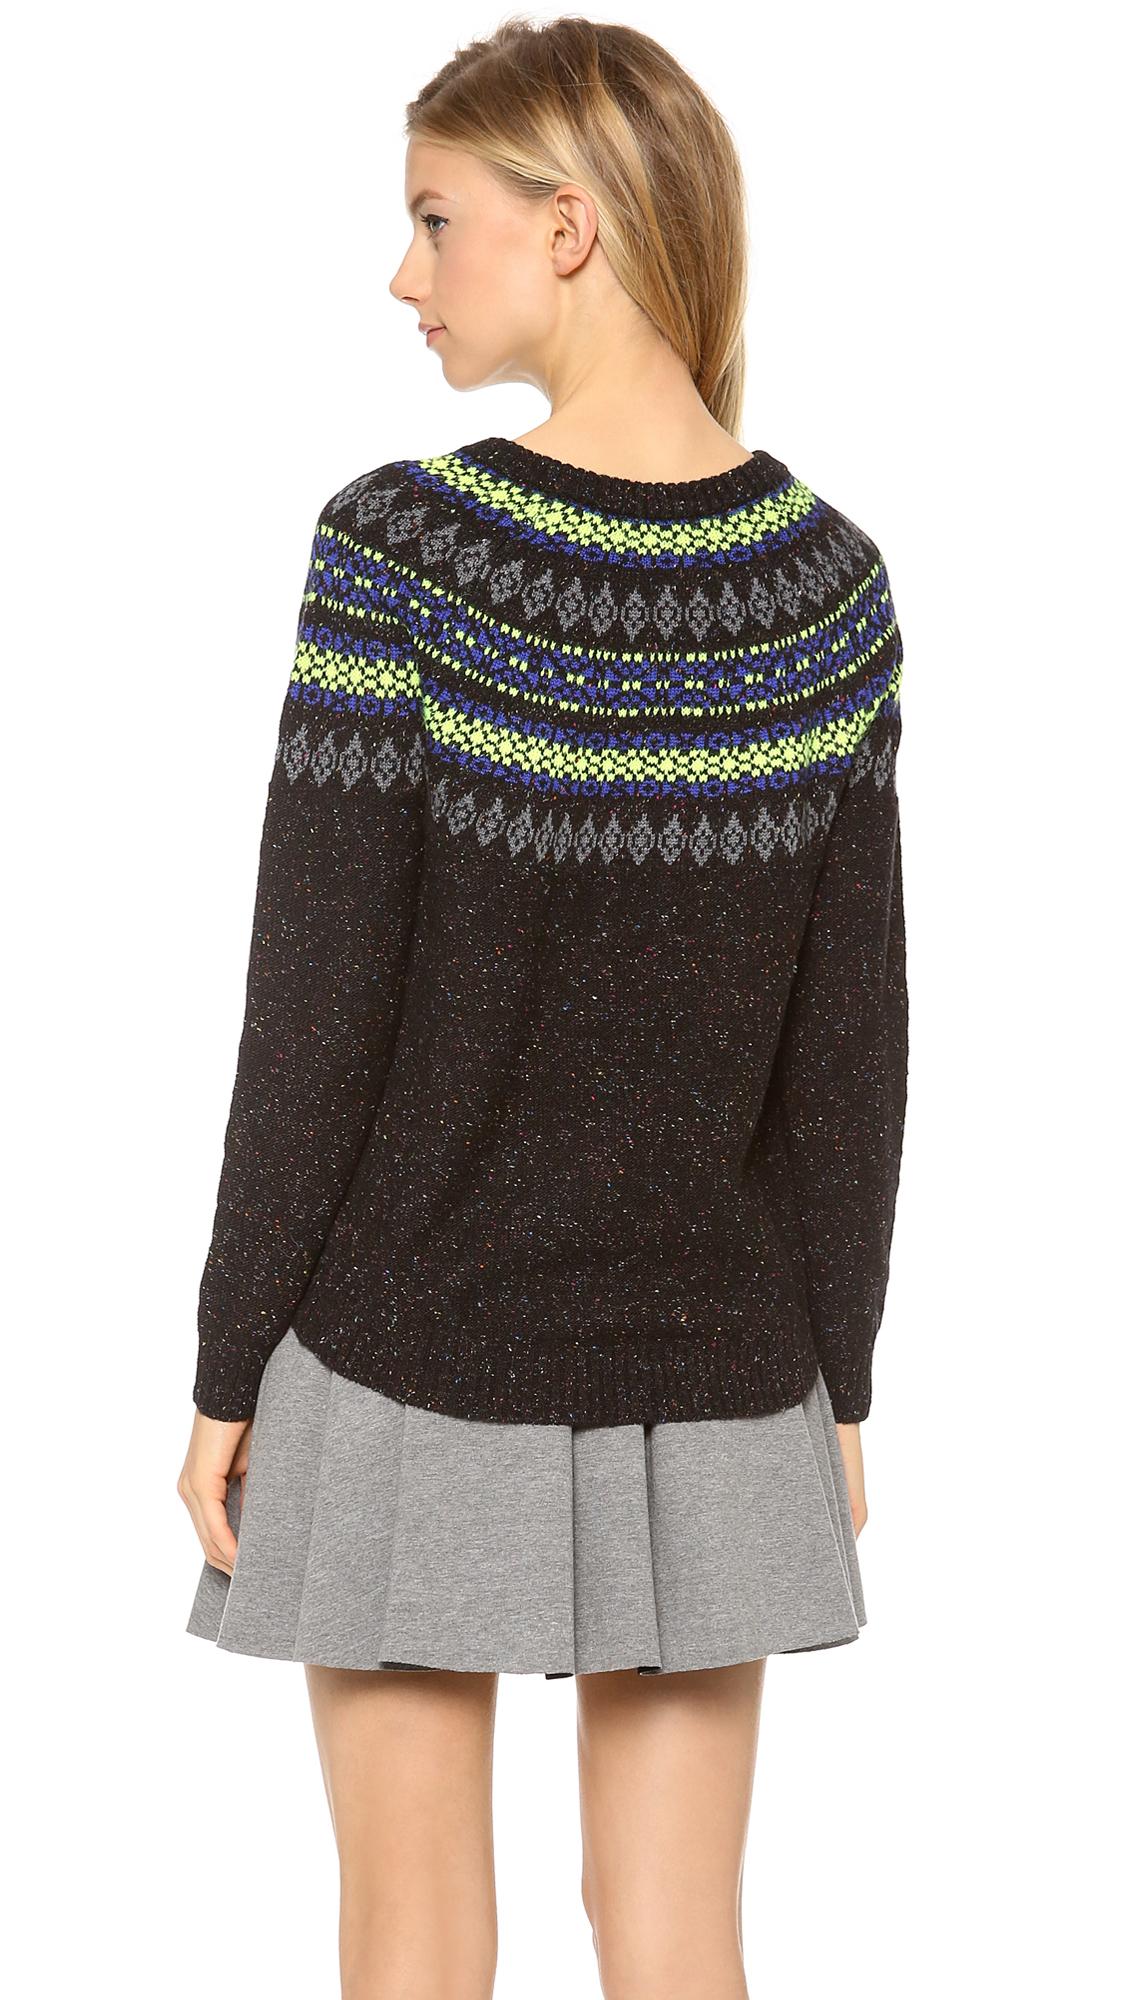 neon fair isle sweater coat nj. Black Bedroom Furniture Sets. Home Design Ideas